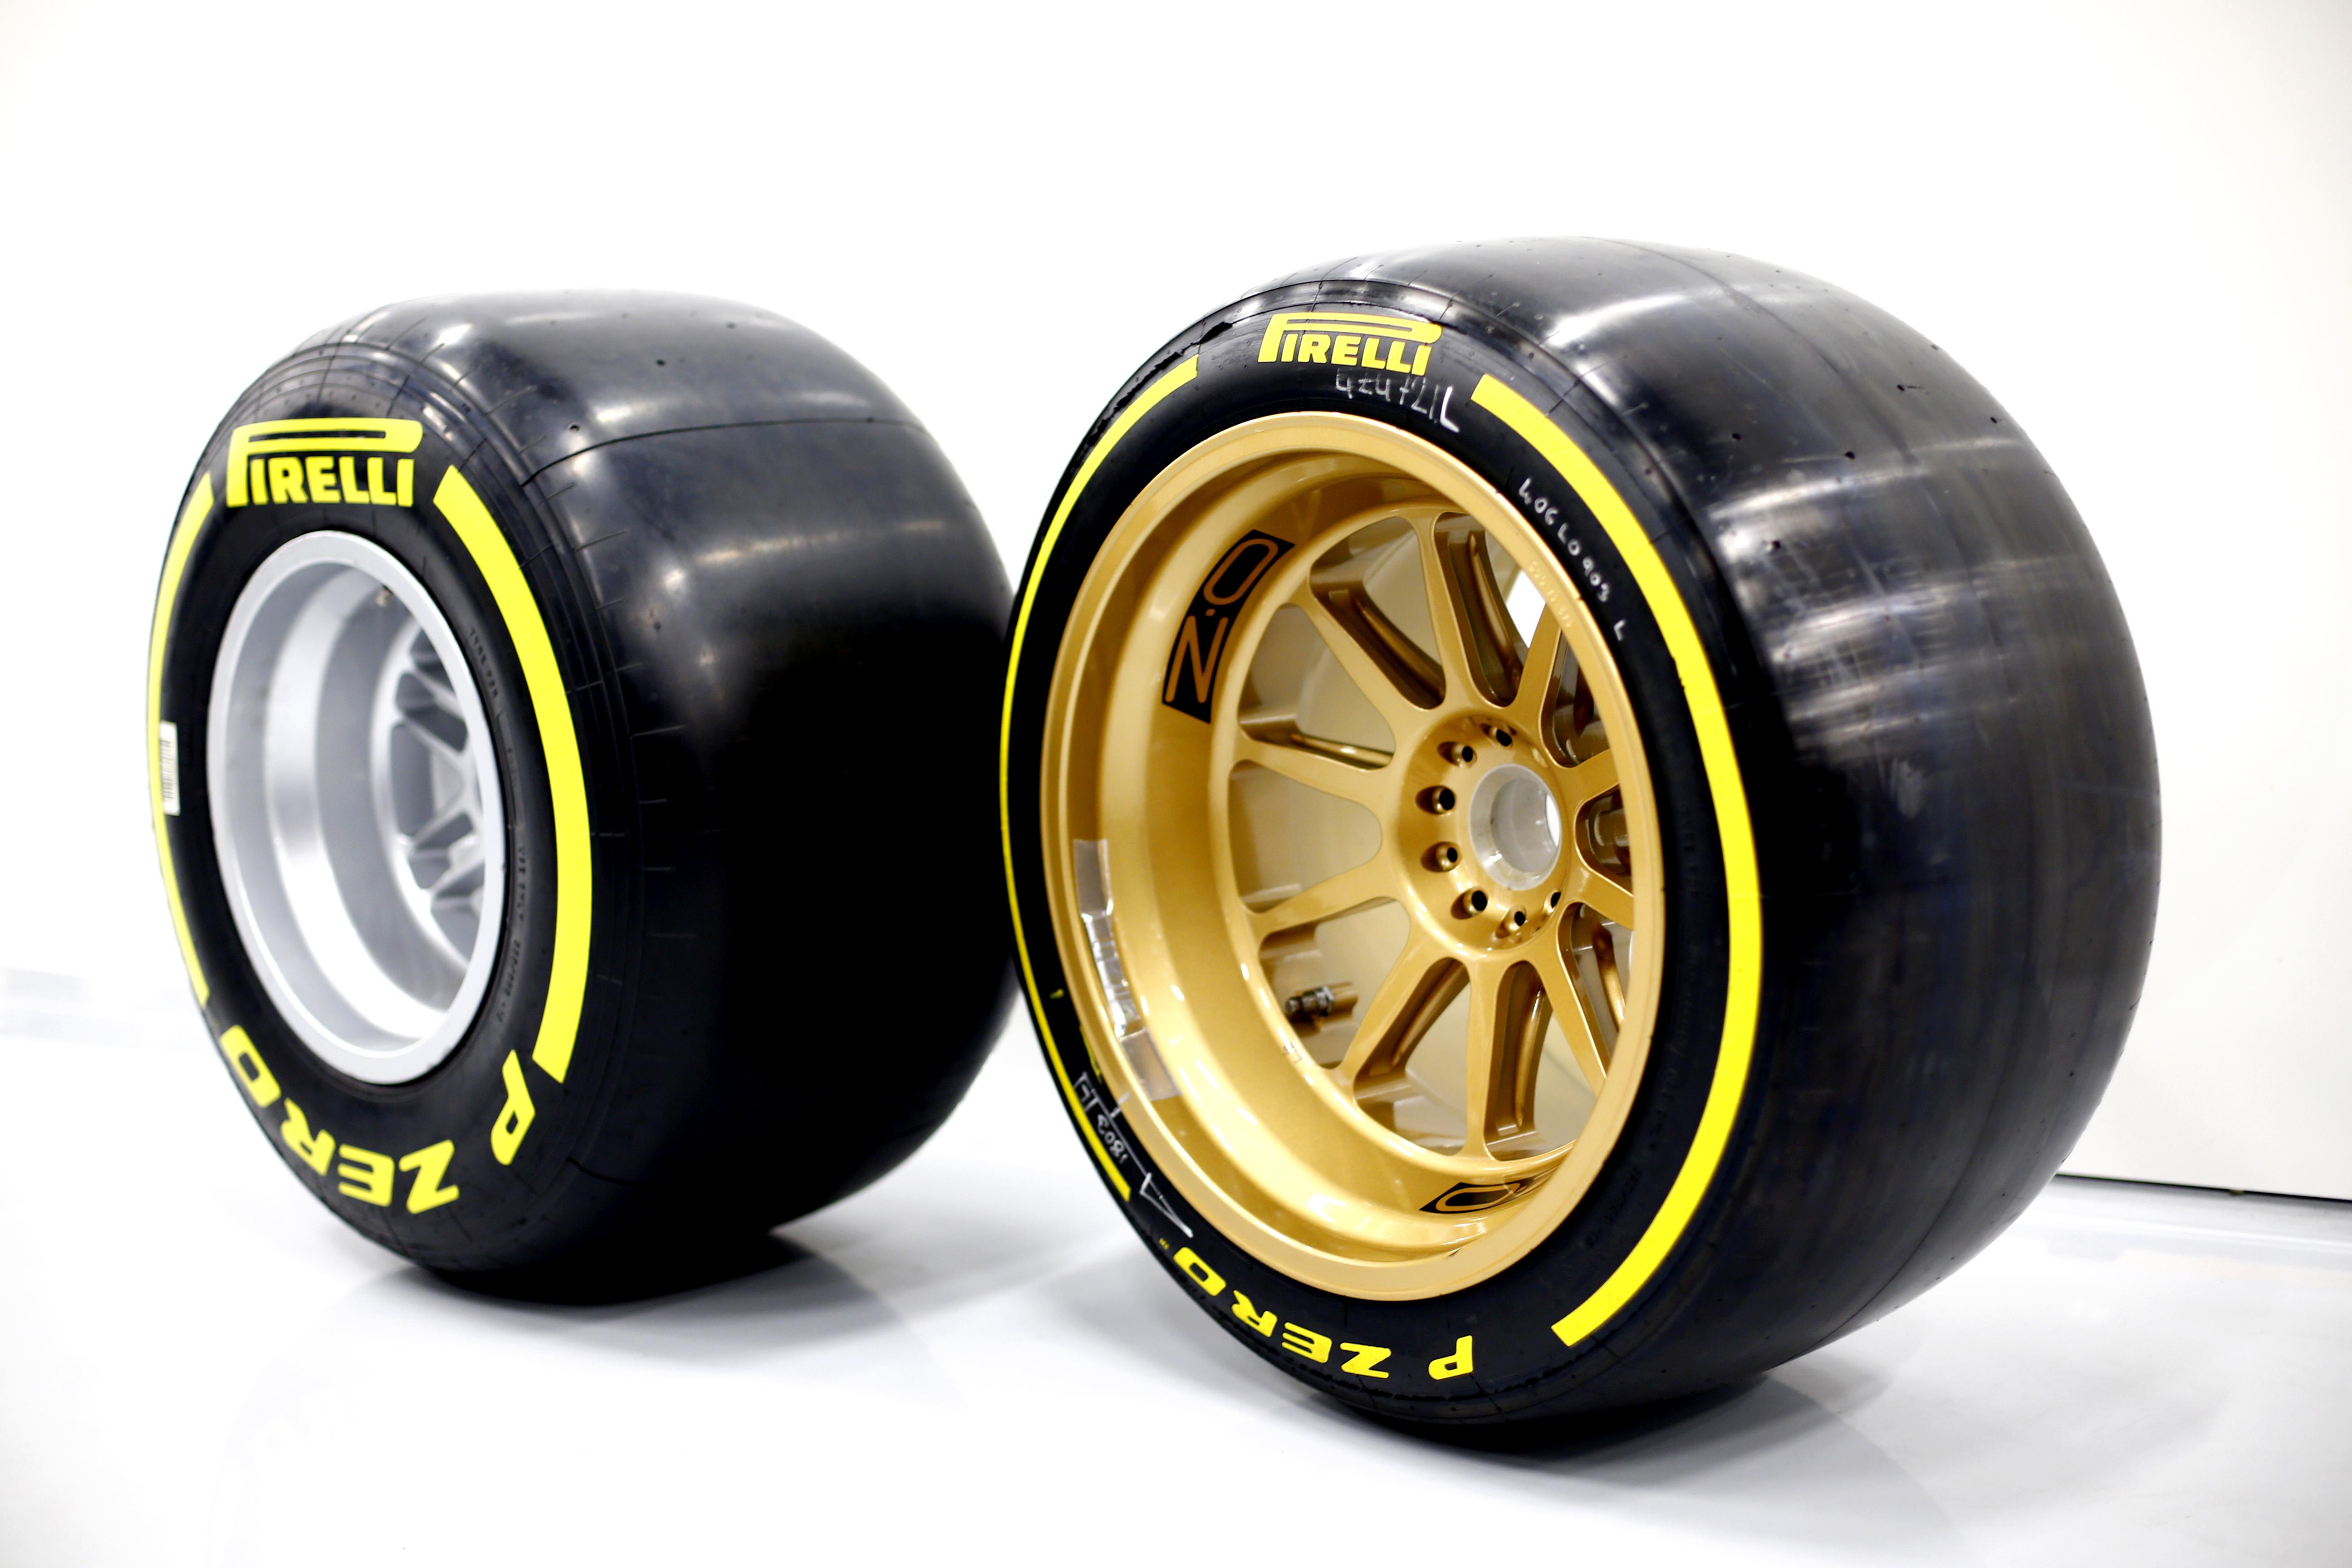 Pirelli 18 Inch Tyre Concept